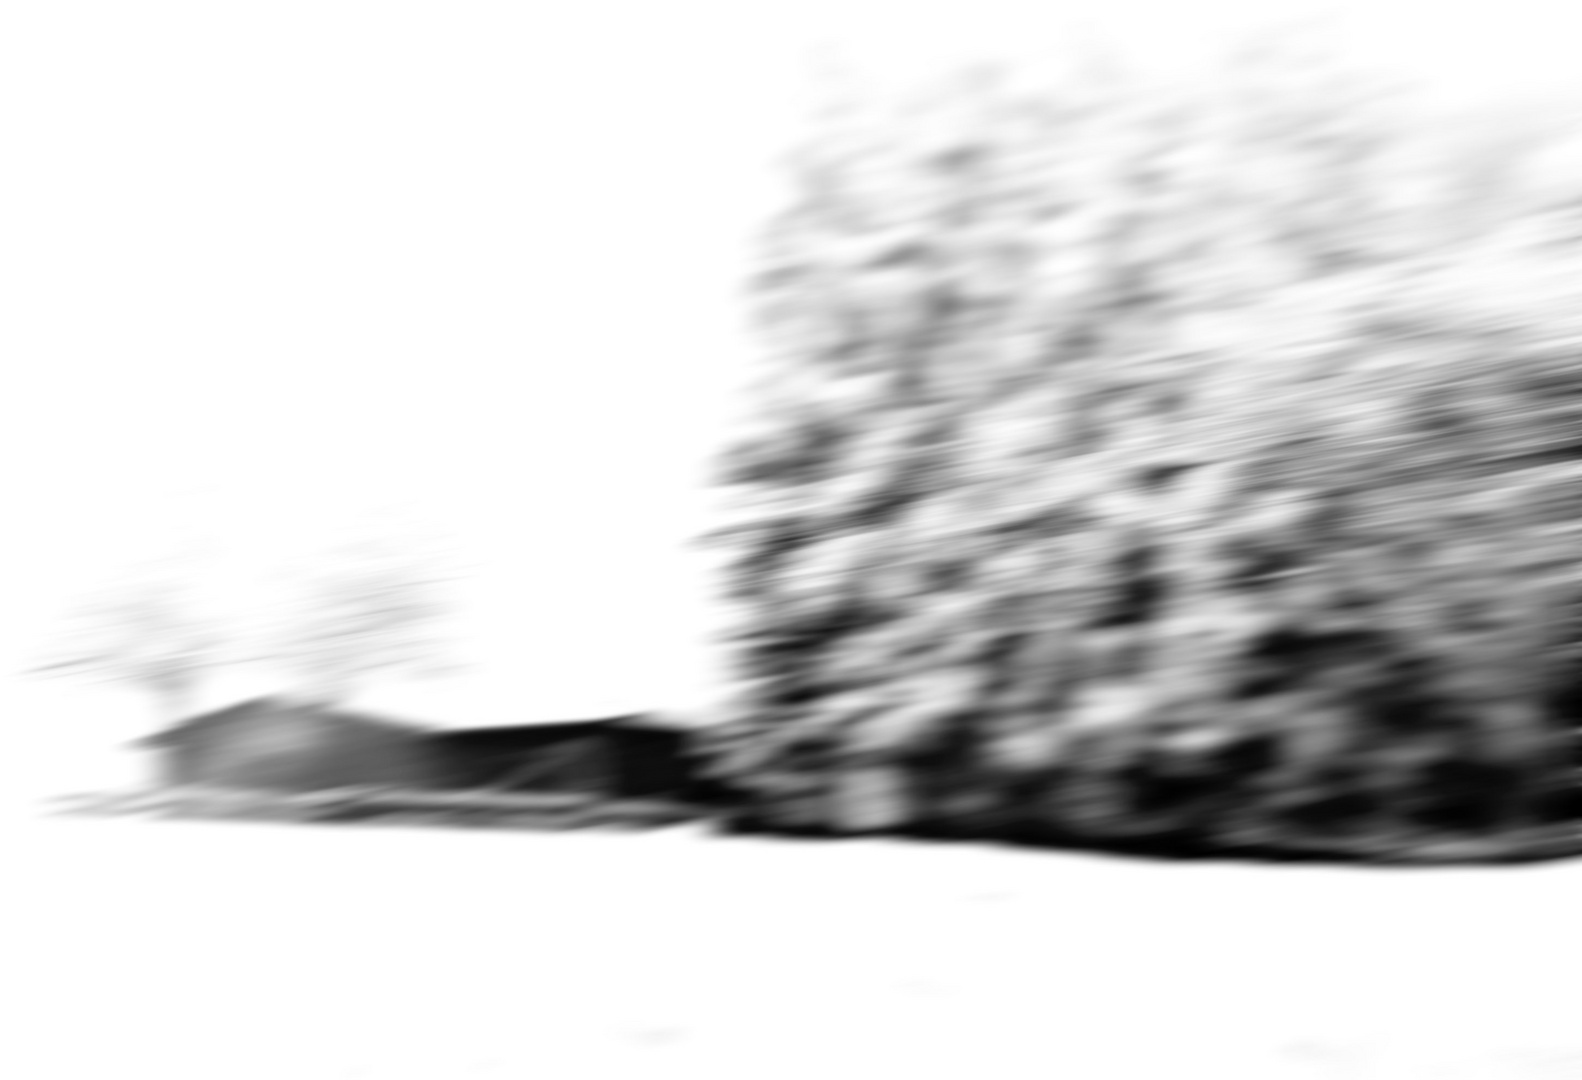 Winterland's letztes Haus